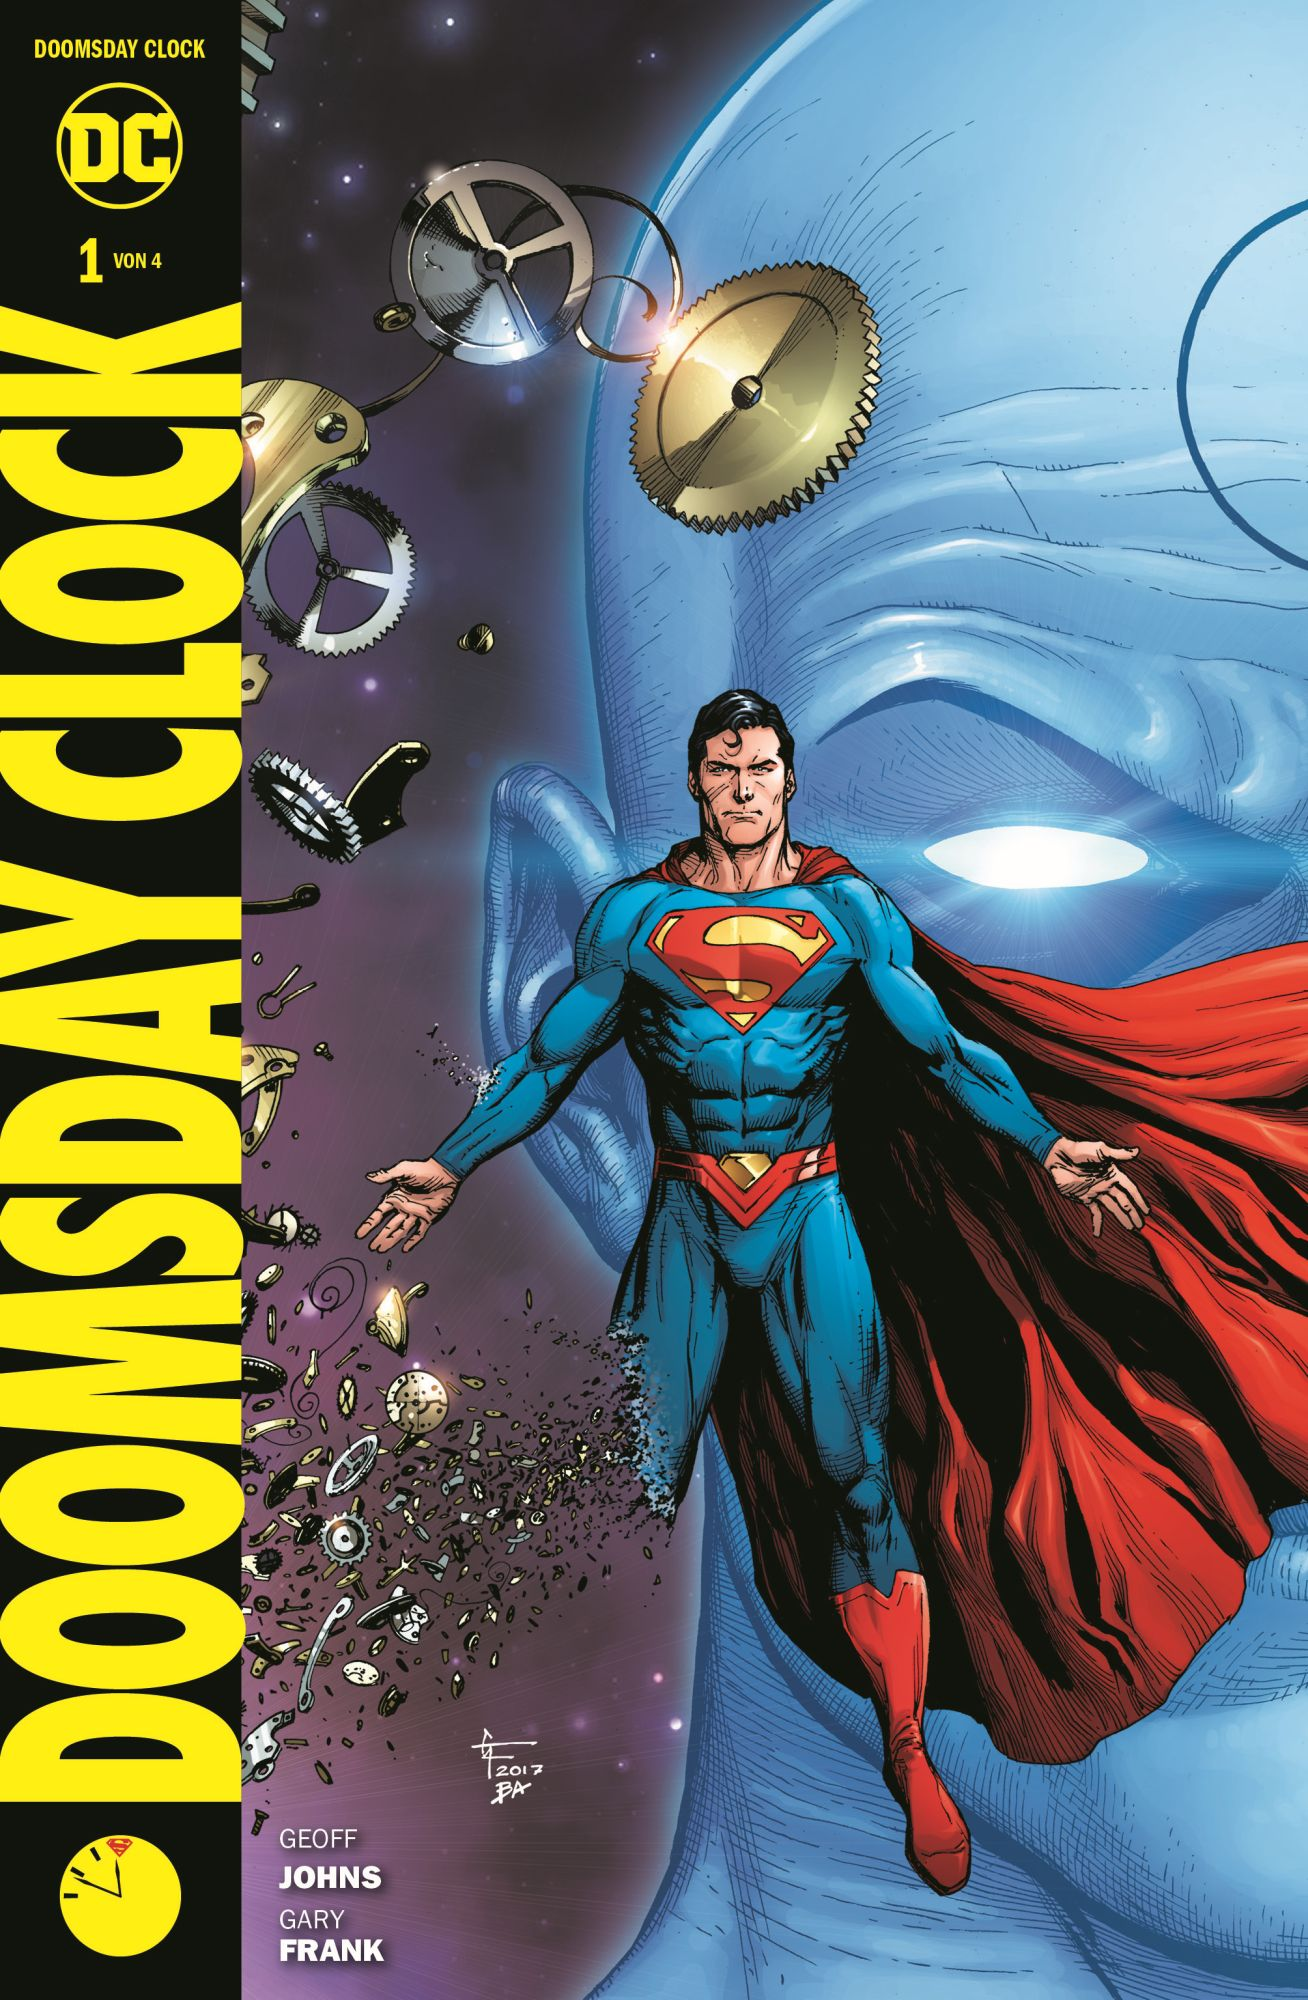 Doomsday Clock Bd. 1-4